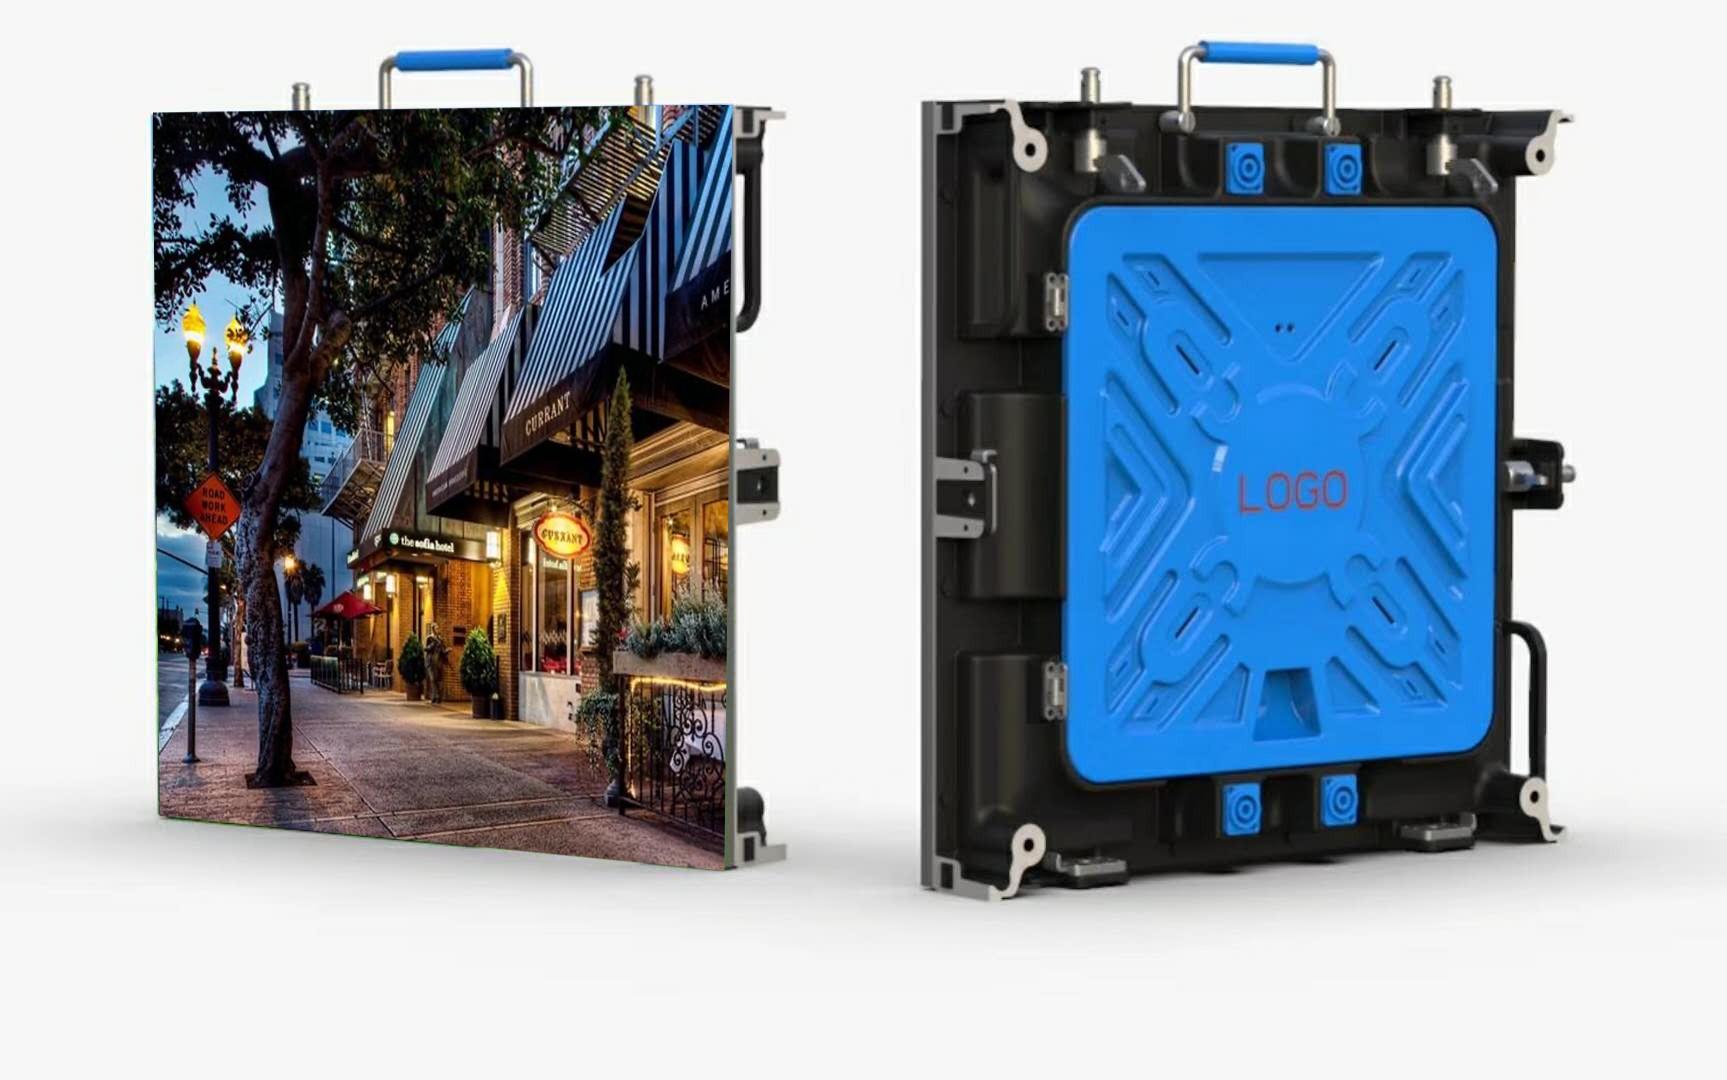 Comprar p4 pantalla LED de interior, p4 pantalla LED de interior Precios, p4 pantalla LED de interior Marcas, p4 pantalla LED de interior Fabricante, p4 pantalla LED de interior Citas, p4 pantalla LED de interior Empresa.